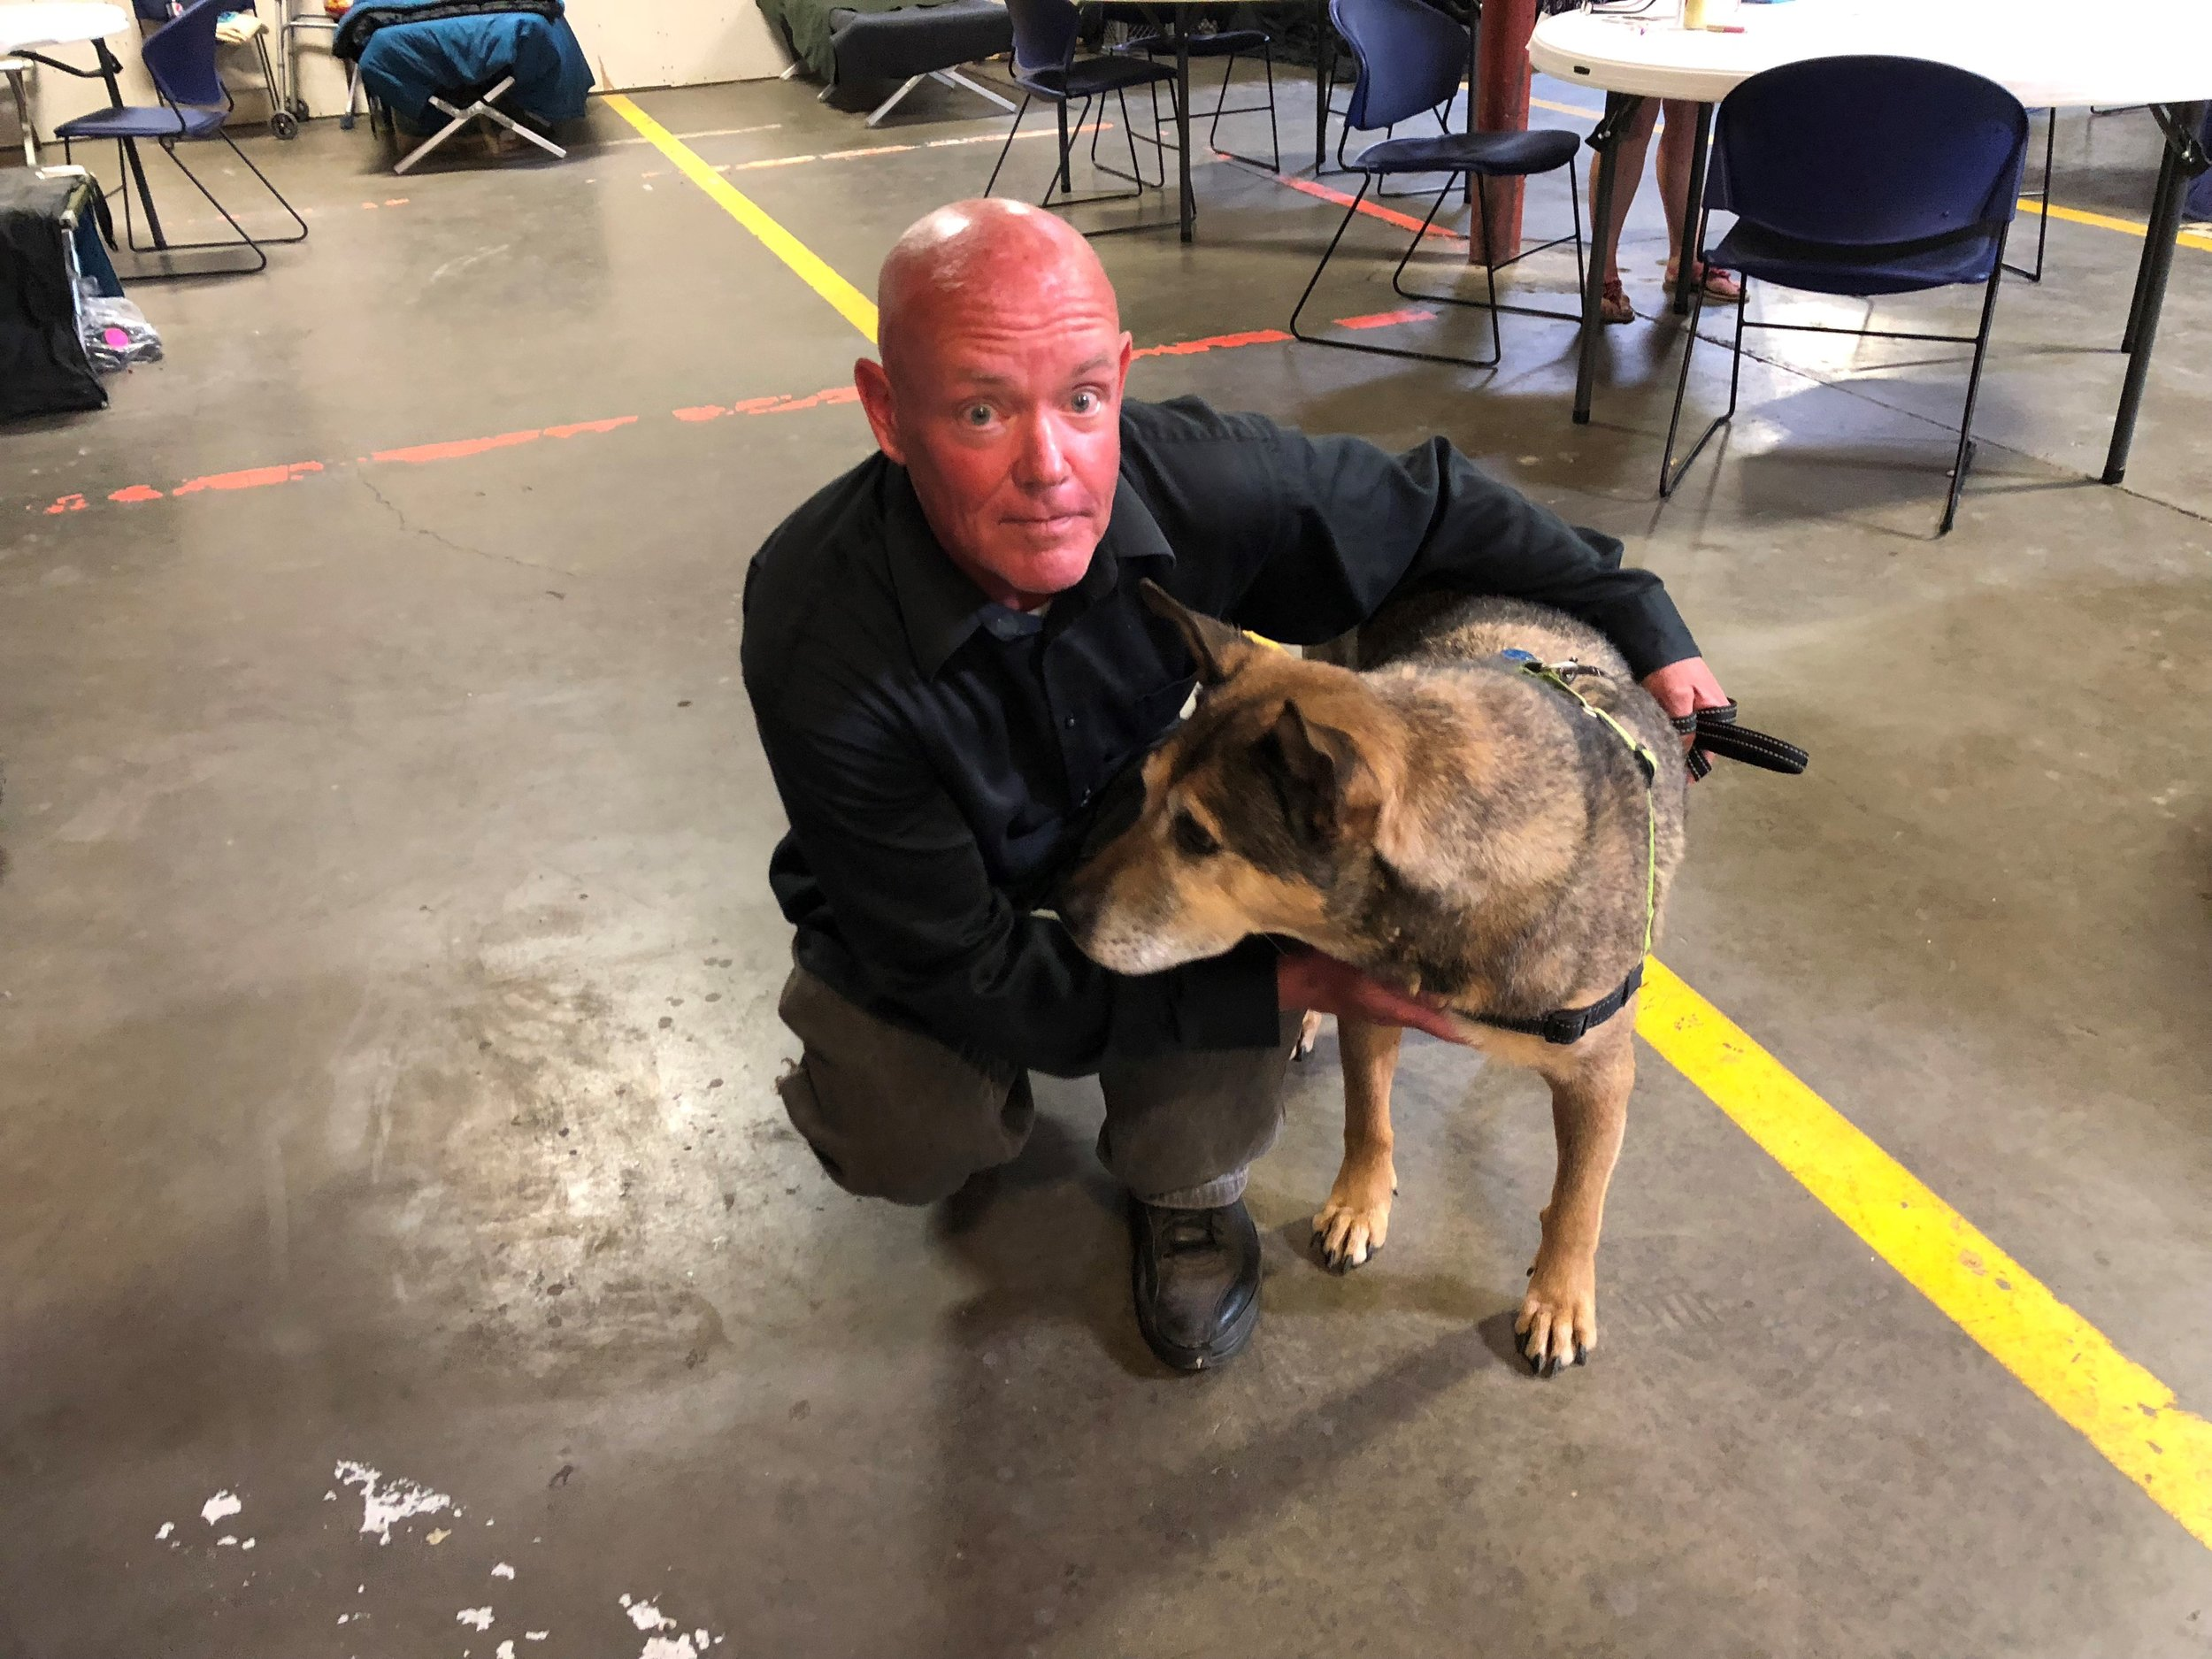 James and dog at homeless shelter.jpg